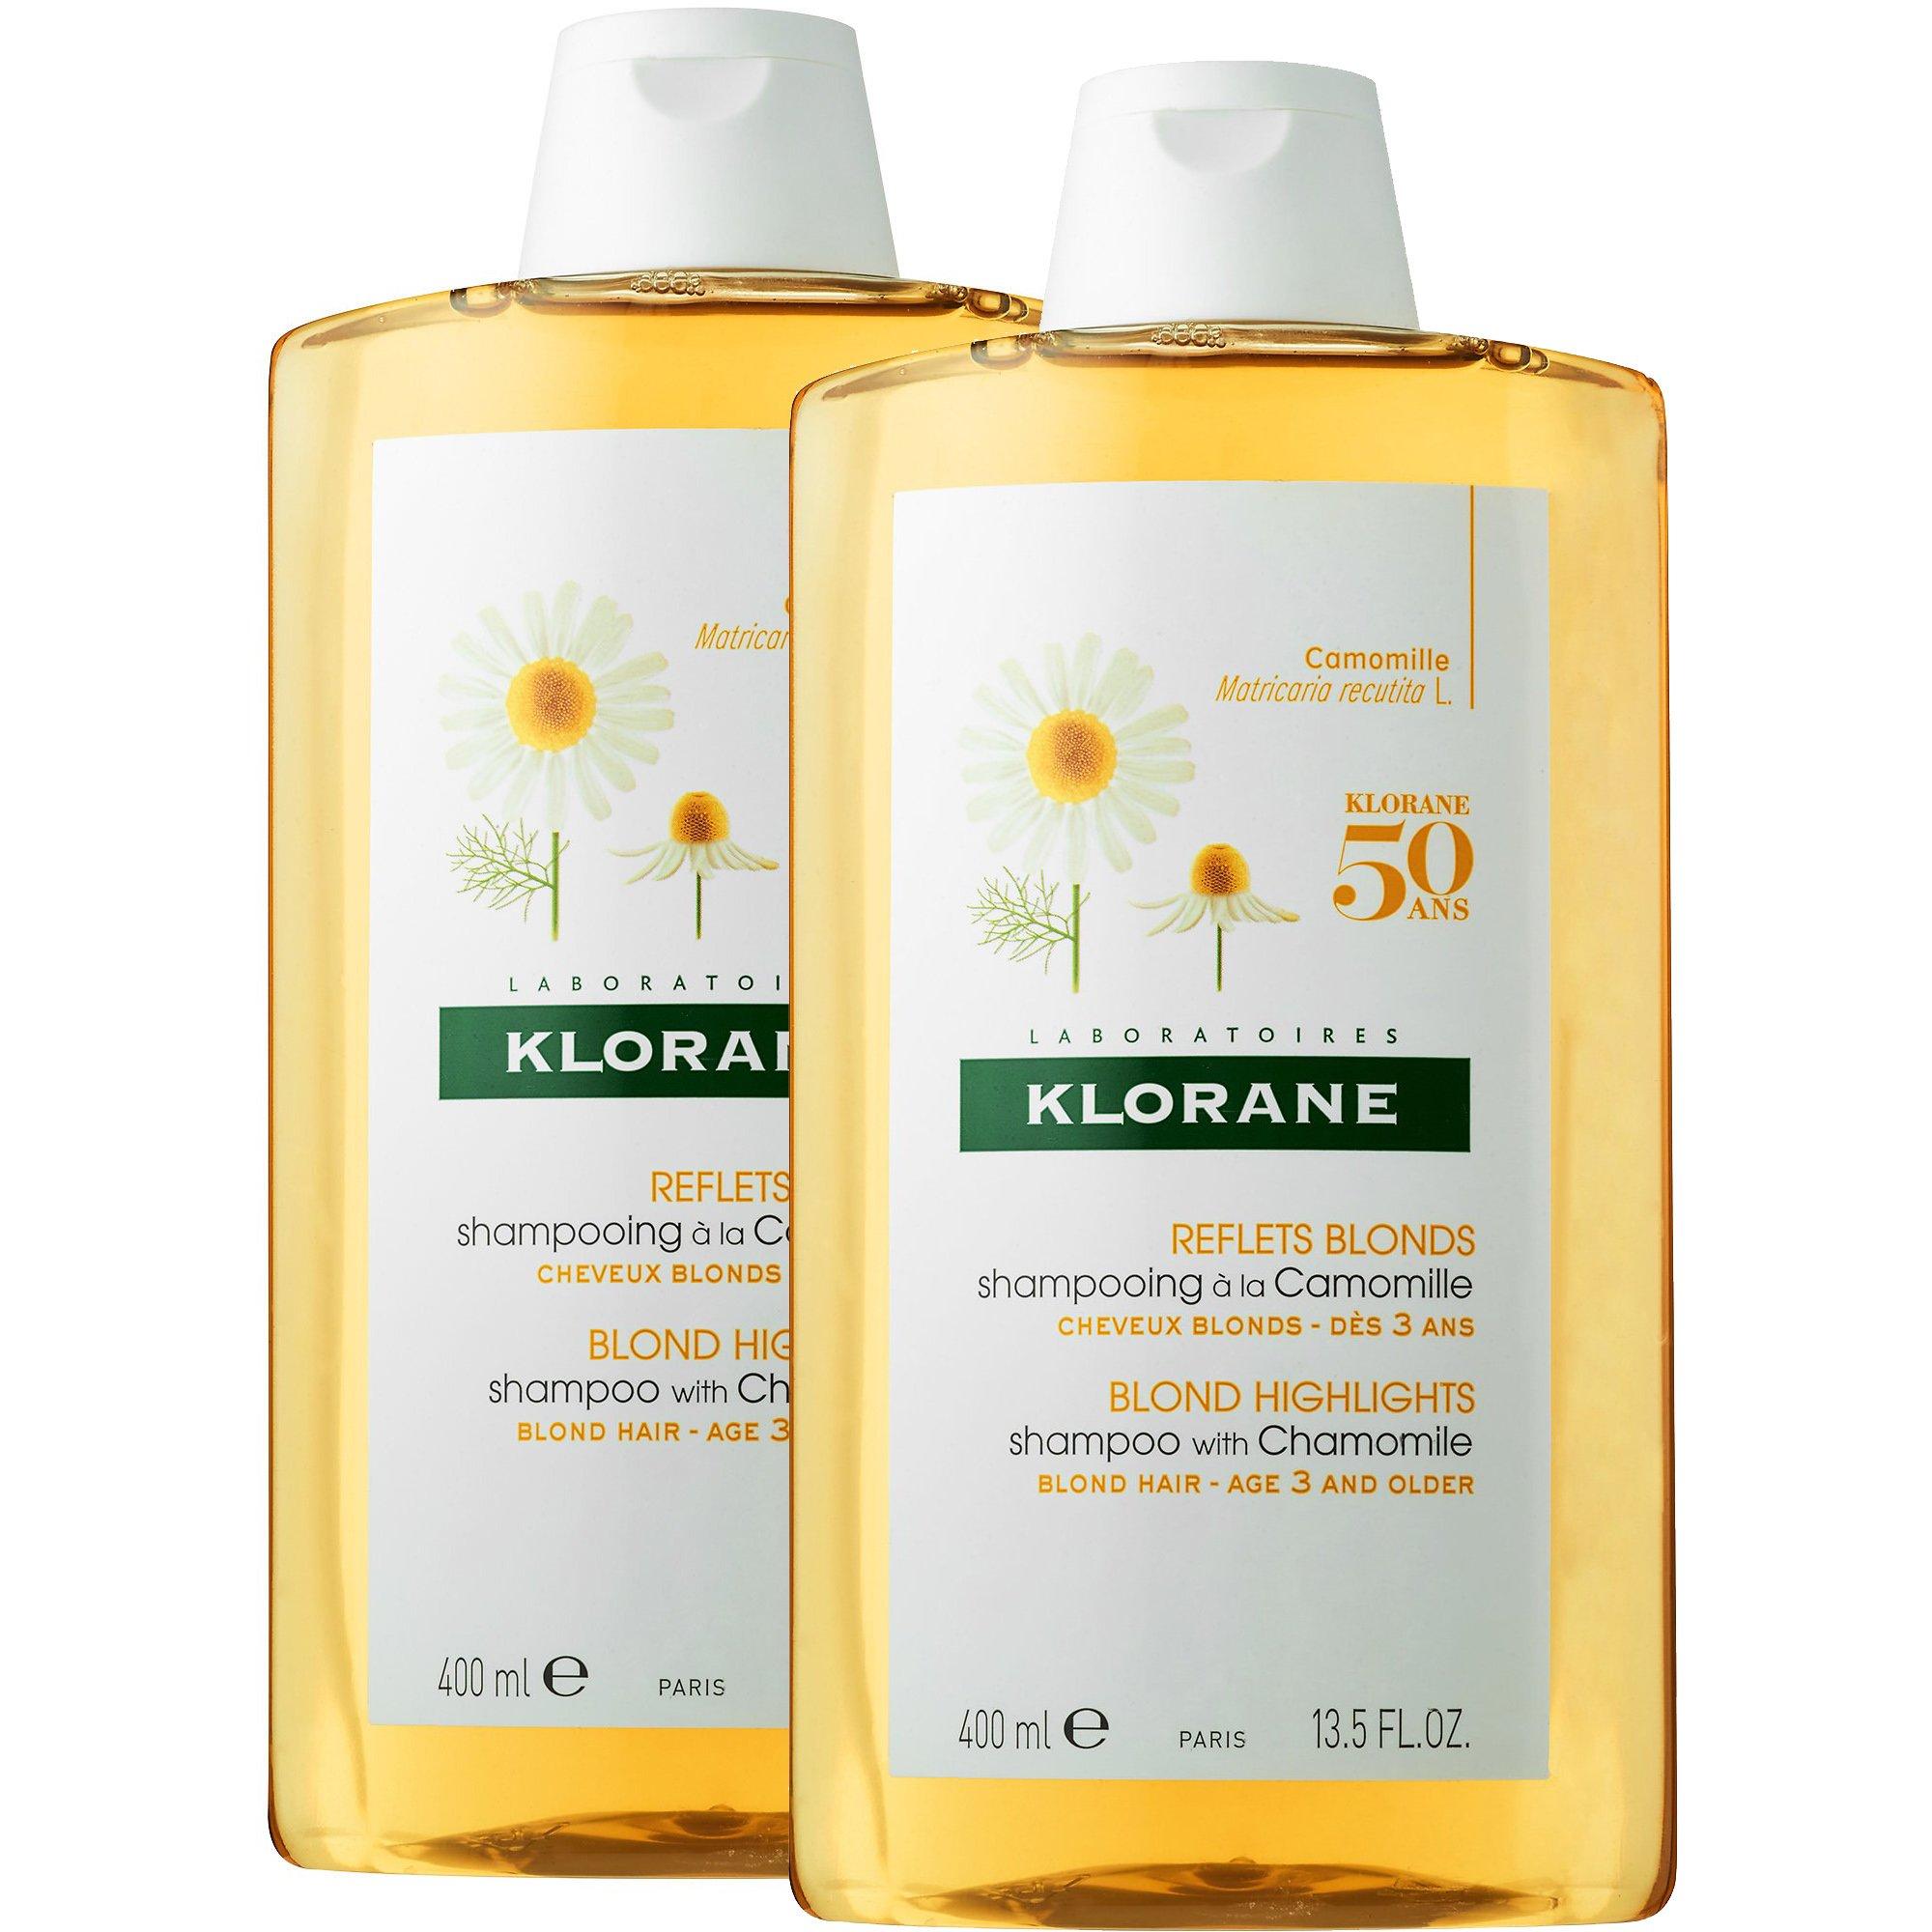 Klorane Πακέτο Προσφοράς Blond Highlights Shampoo with Chamomile Σαμπουάν με Εκχύλισμα Χαμομηλιού για Ξανθές Ανταύγειες 2x400ml